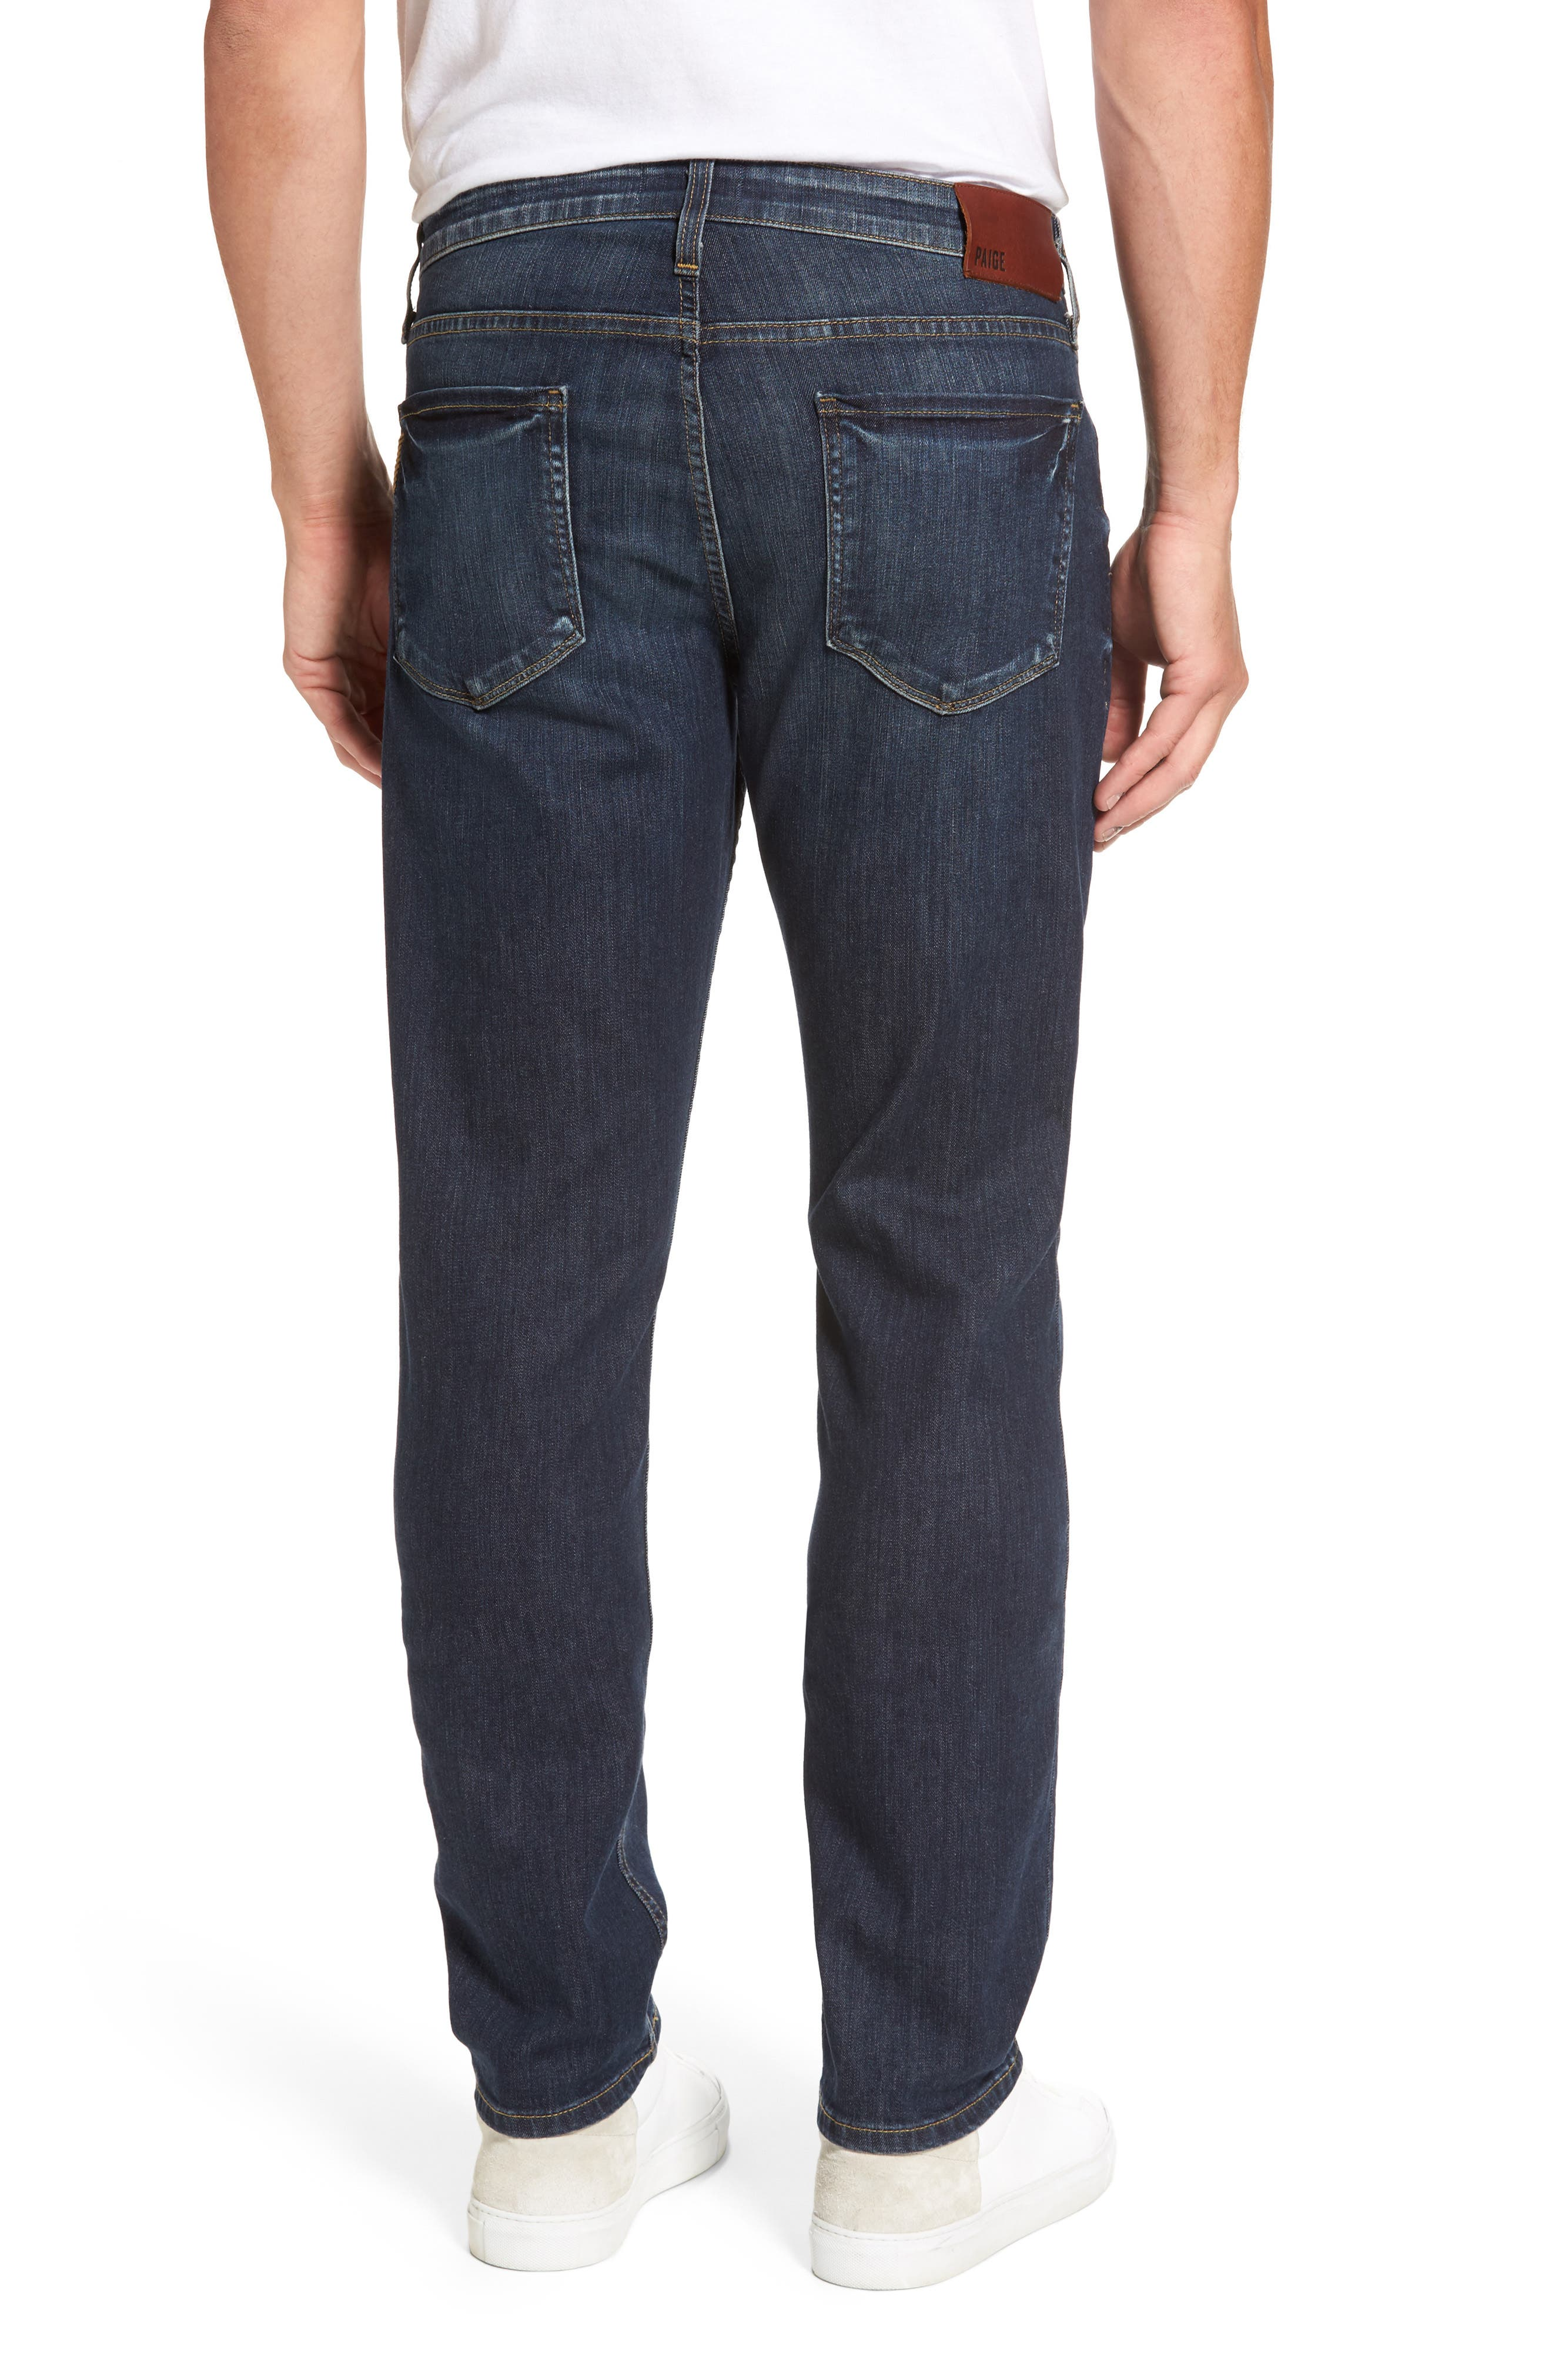 PAIGE,                             Legacy - Federal Slim Straight Leg Jeans,                             Alternate thumbnail 2, color,                             400